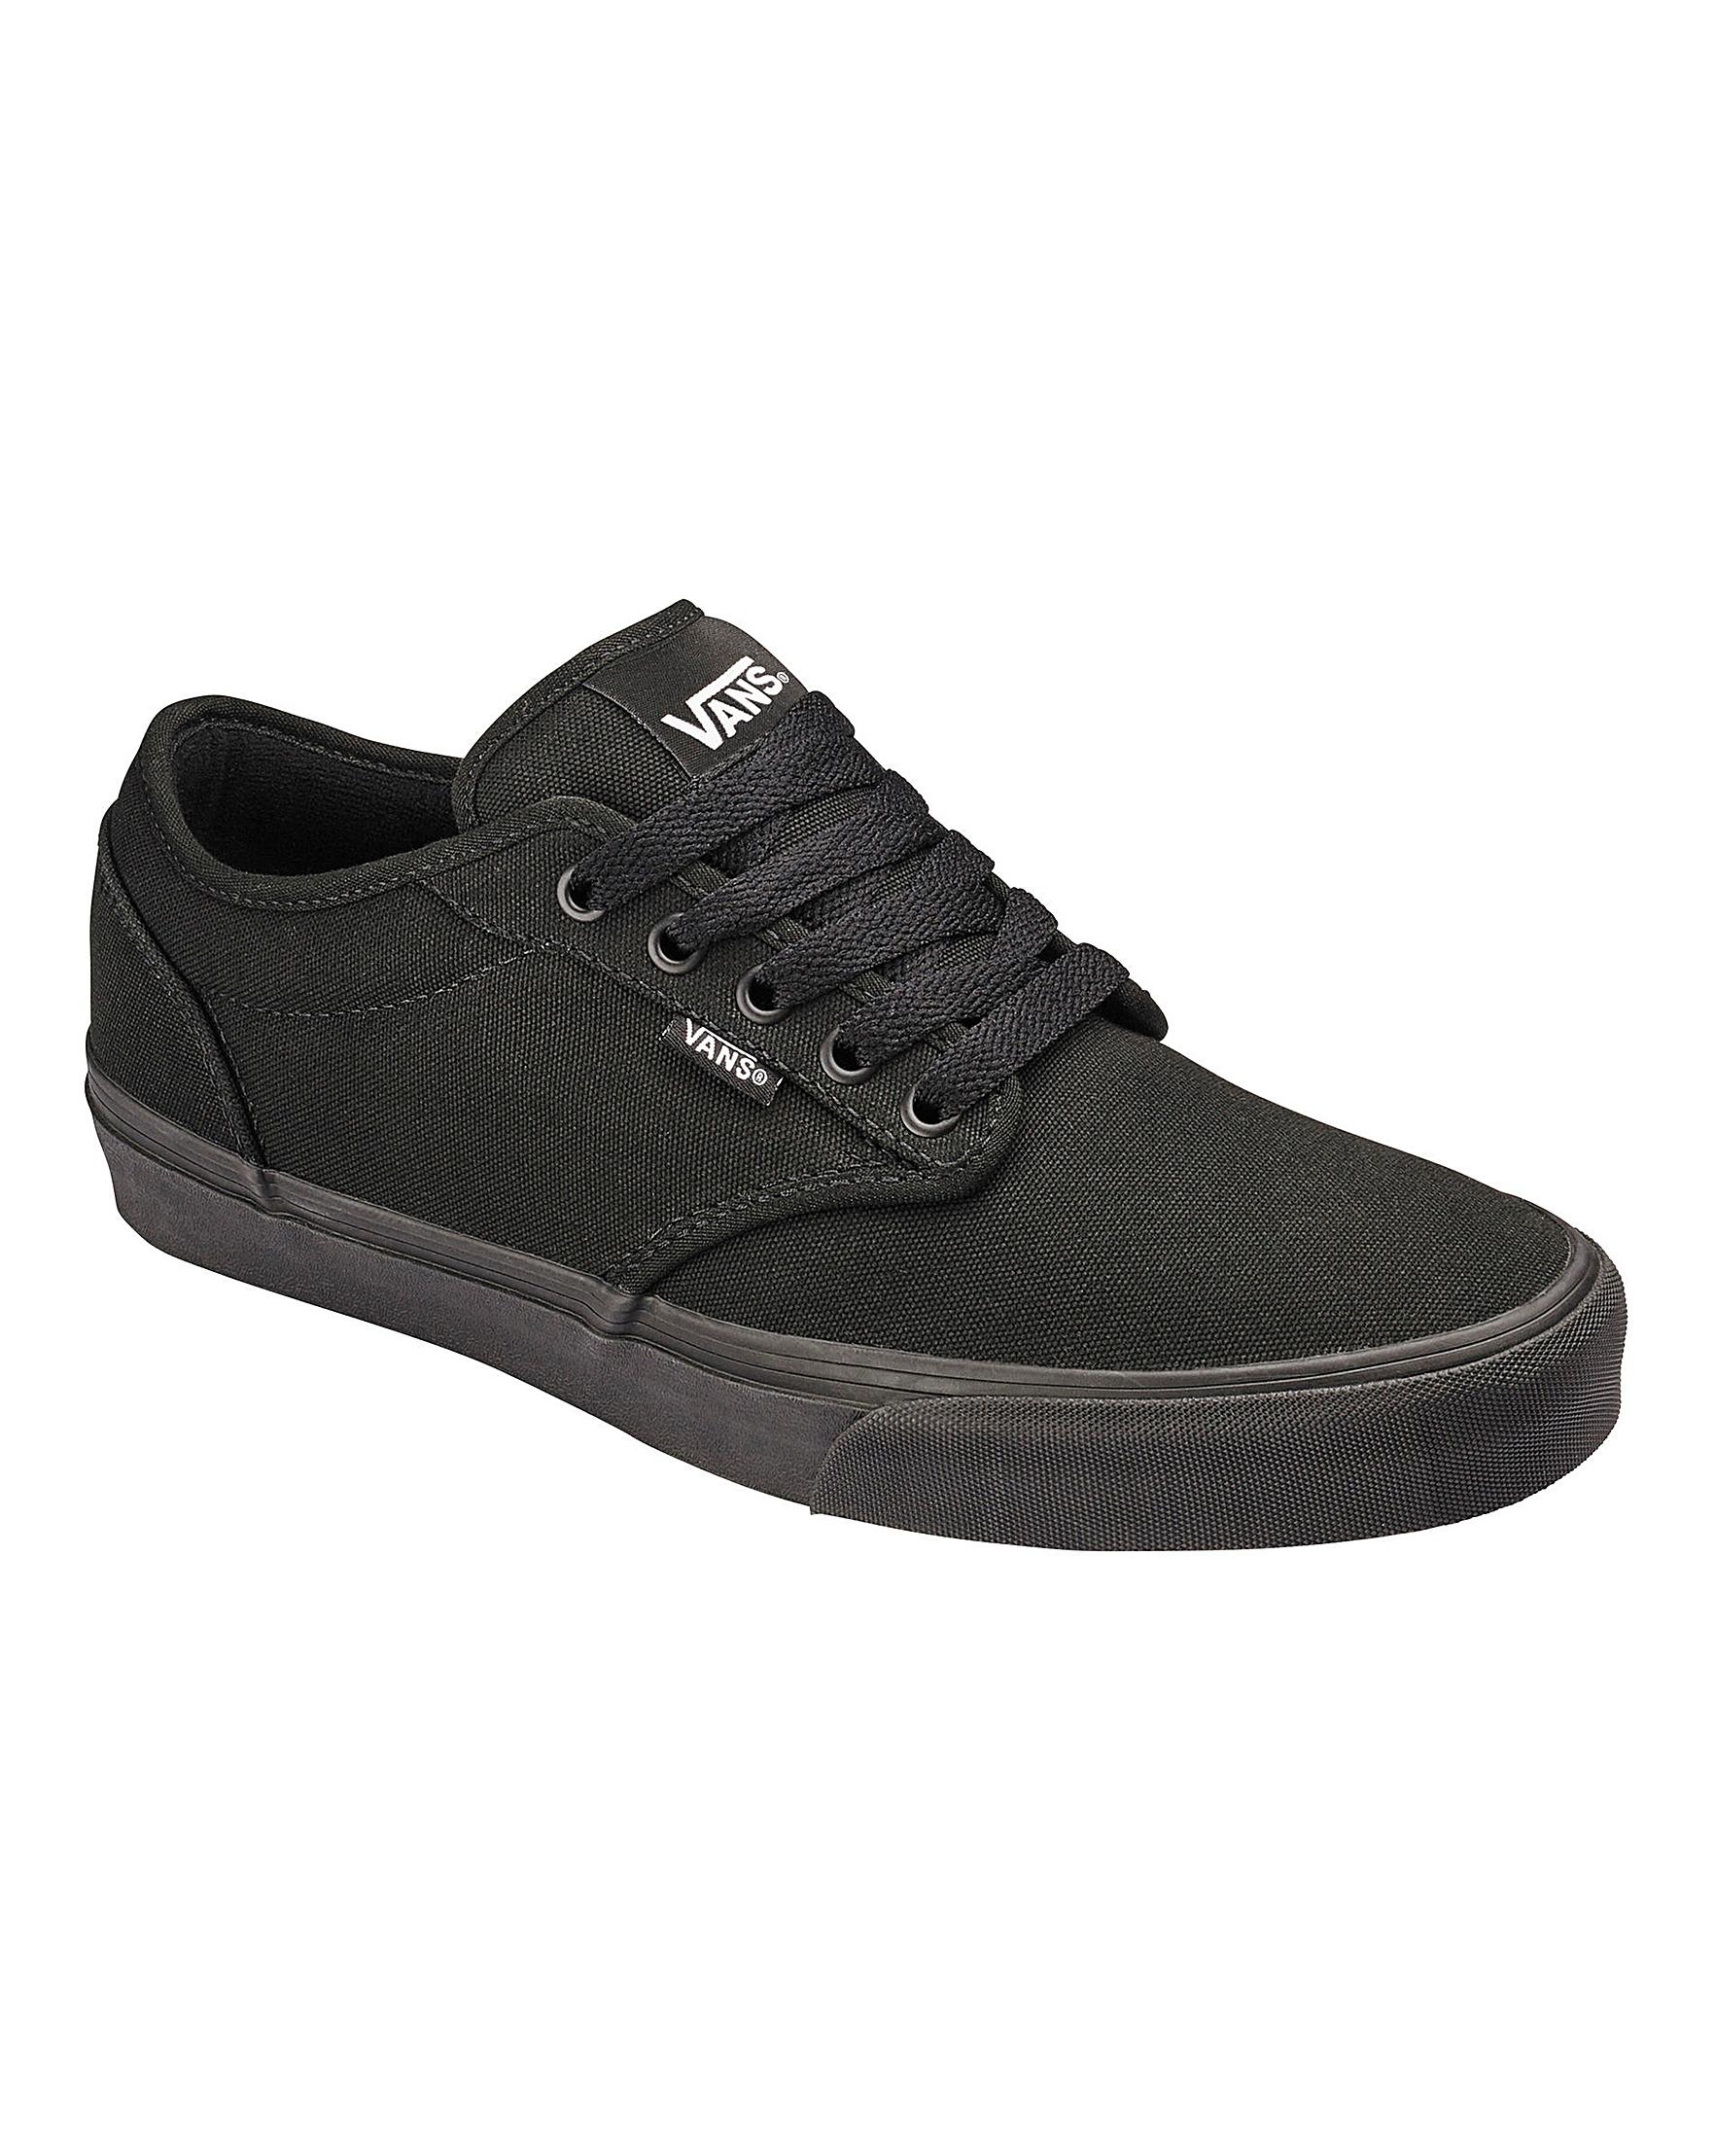 23bb9be3b2b6cf Vans atwood lace up casual shoes jacamo jpg 1764x2217 Chinas vans warehouse